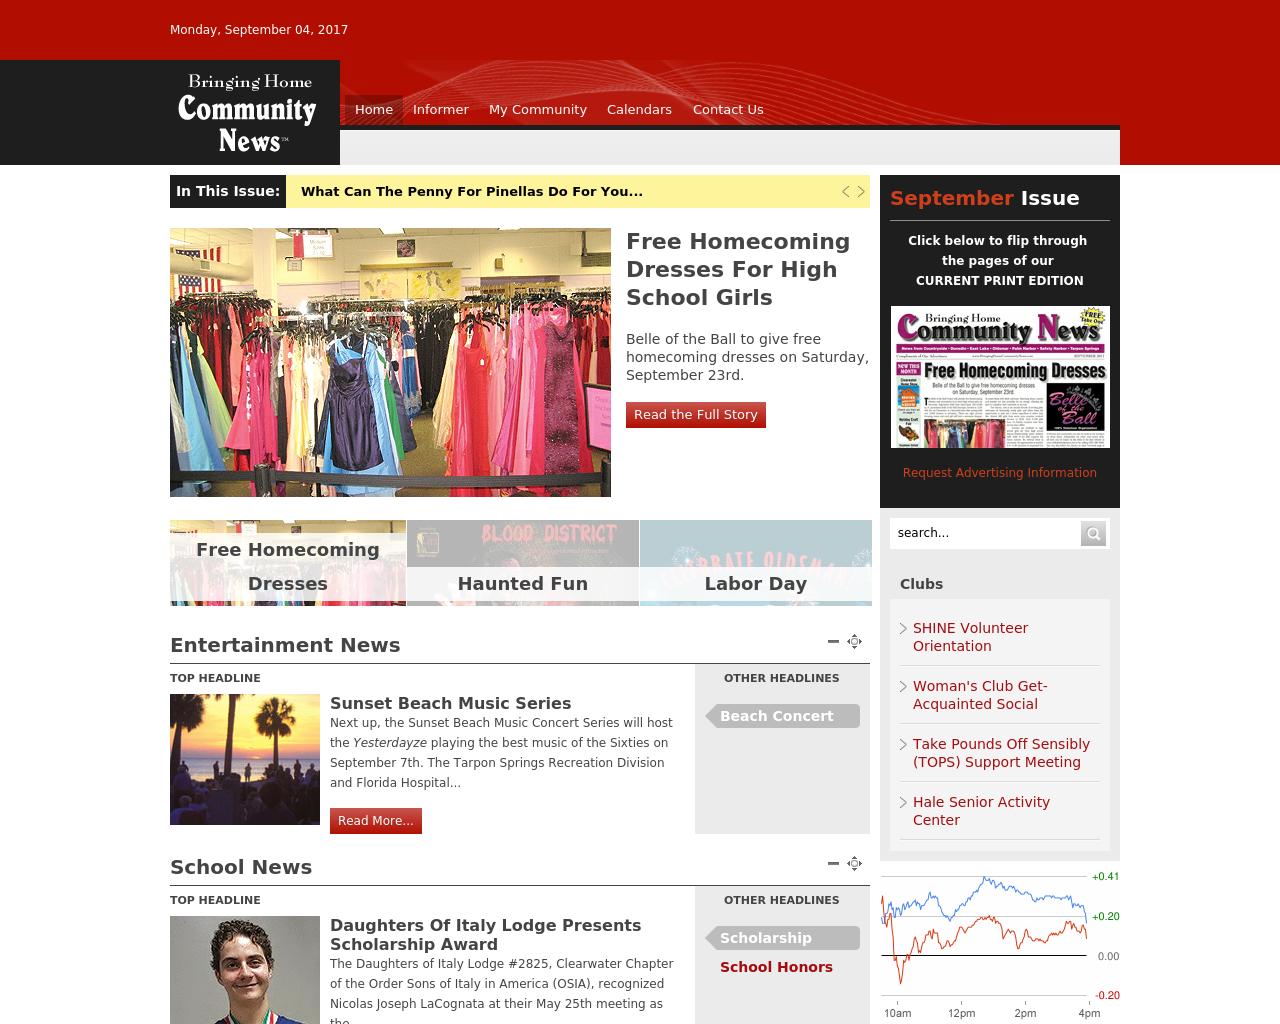 Bringing-Home-Community-News-Advertising-Reviews-Pricing